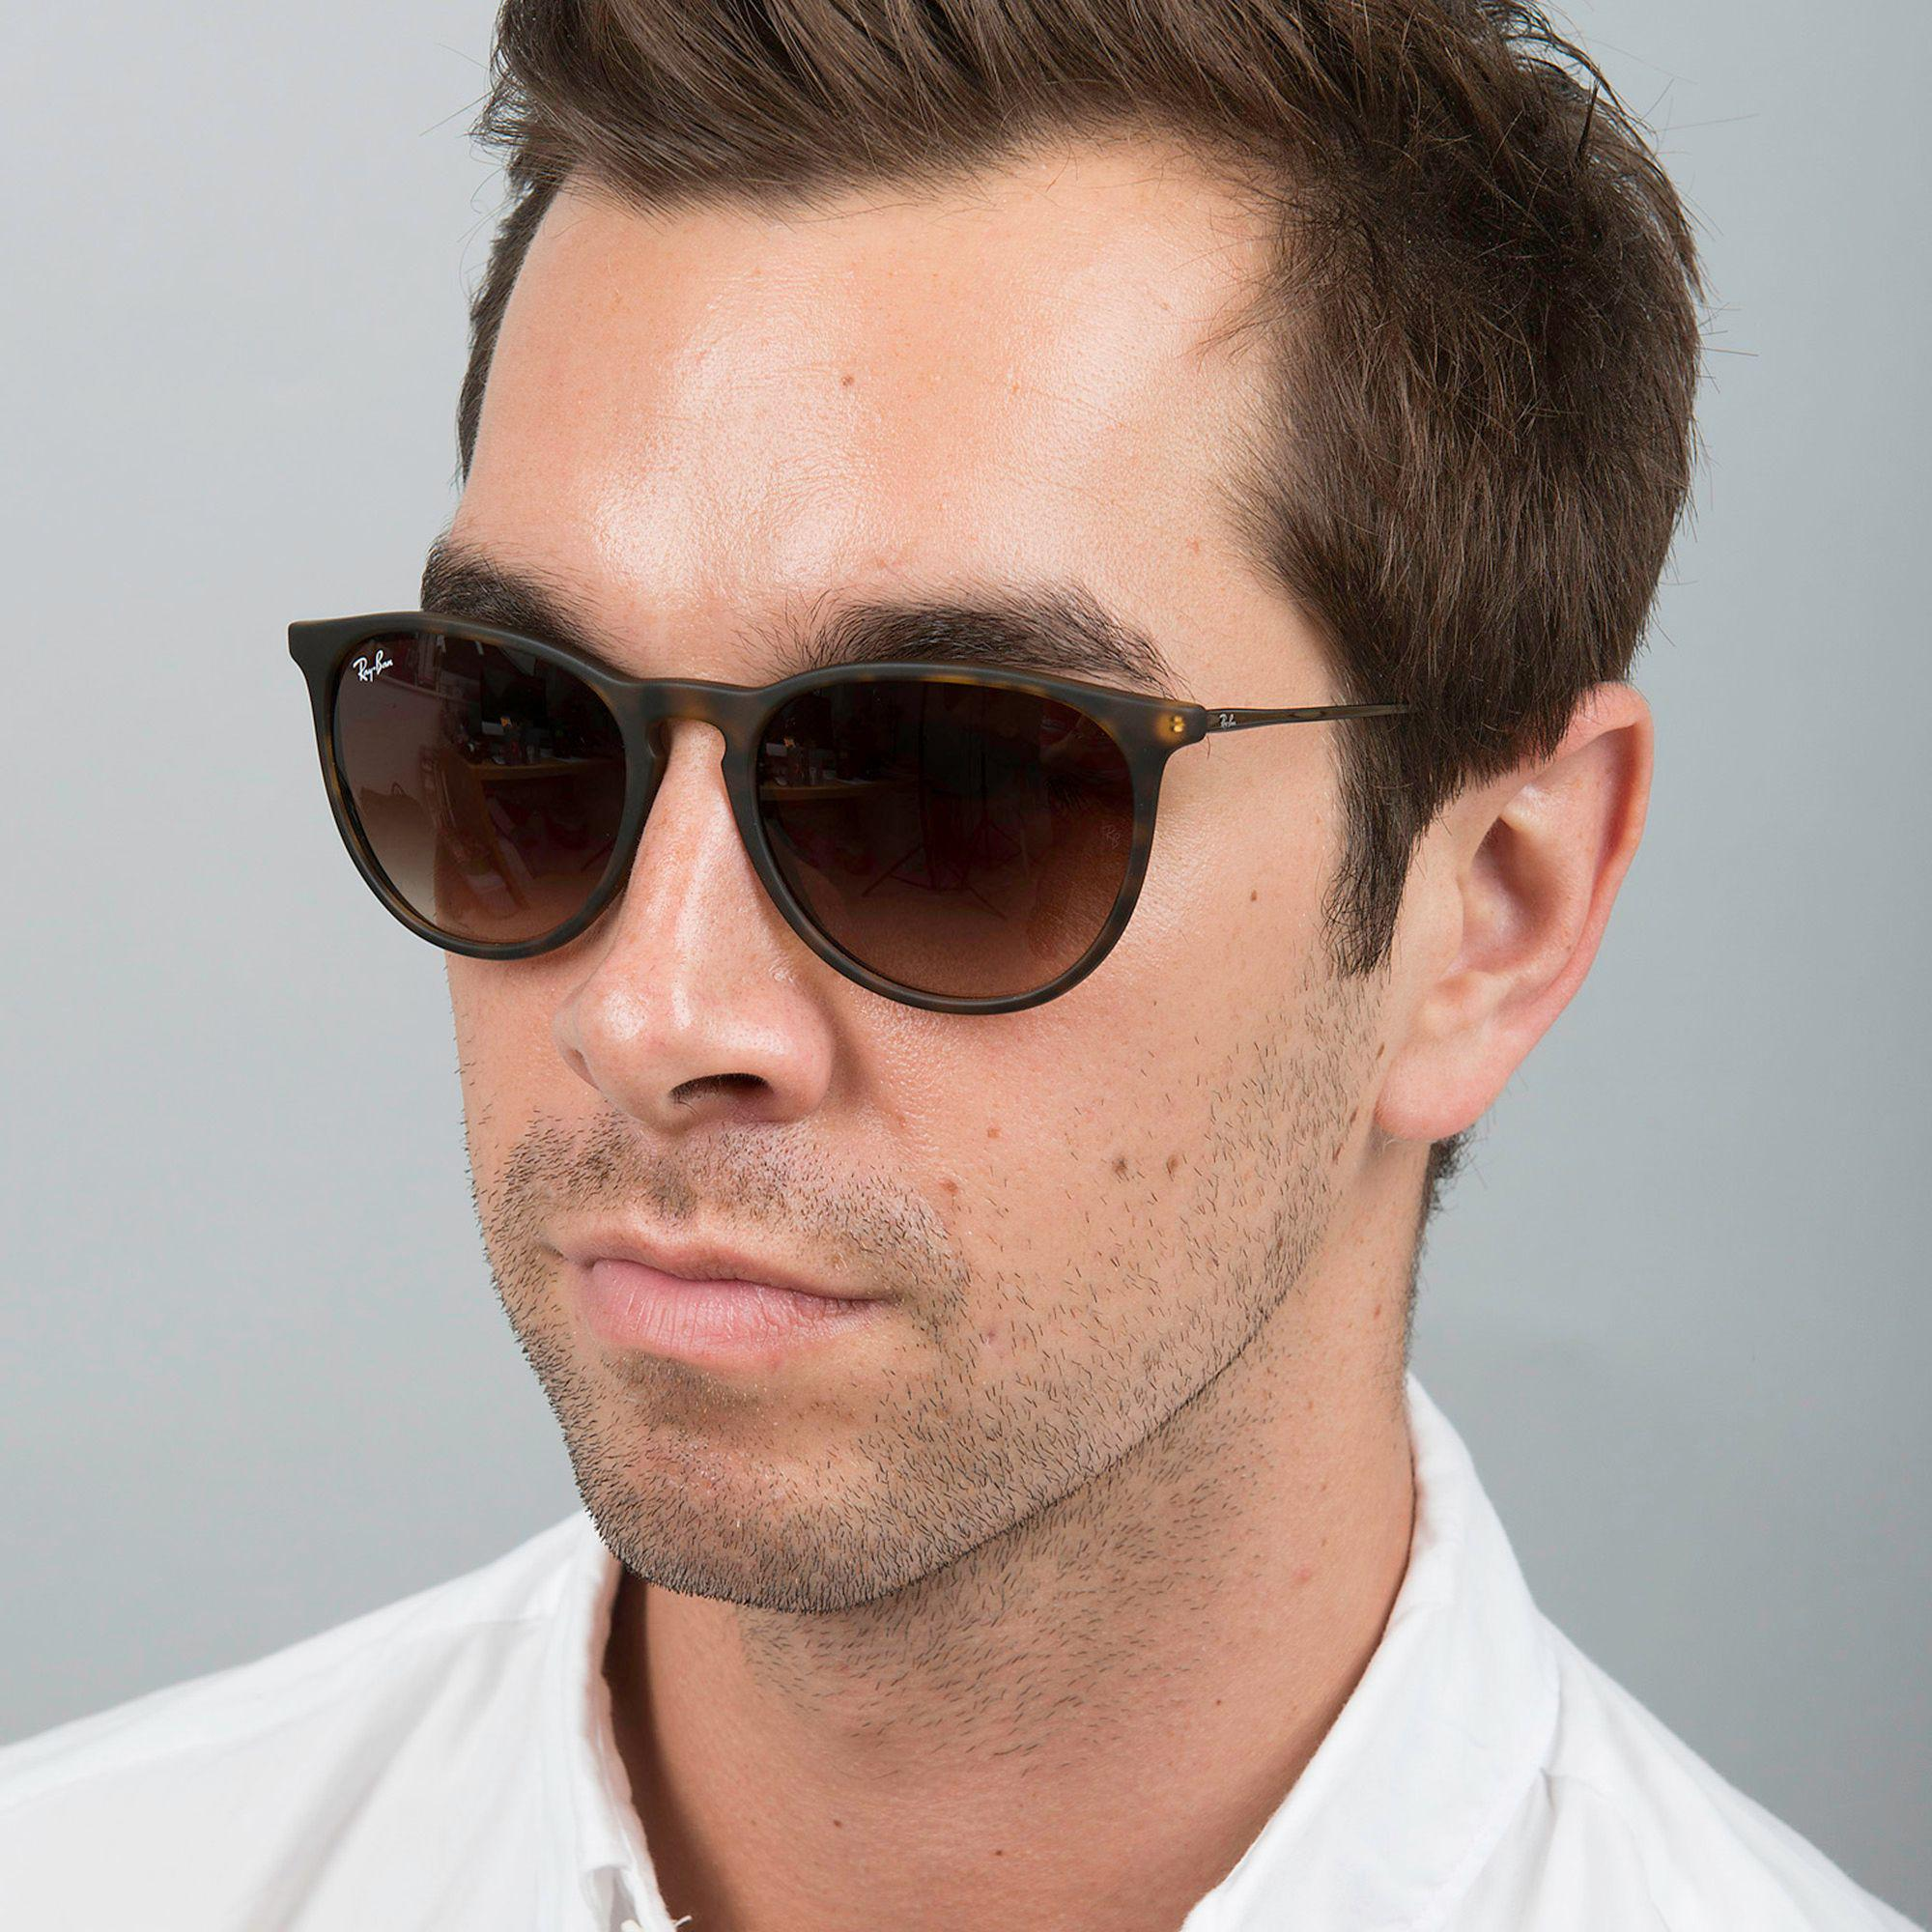 c77fb51e3681 Ray-Ban - Brown  erika  Rb4171 Round Sunglasses for Men - Lyst. View  fullscreen